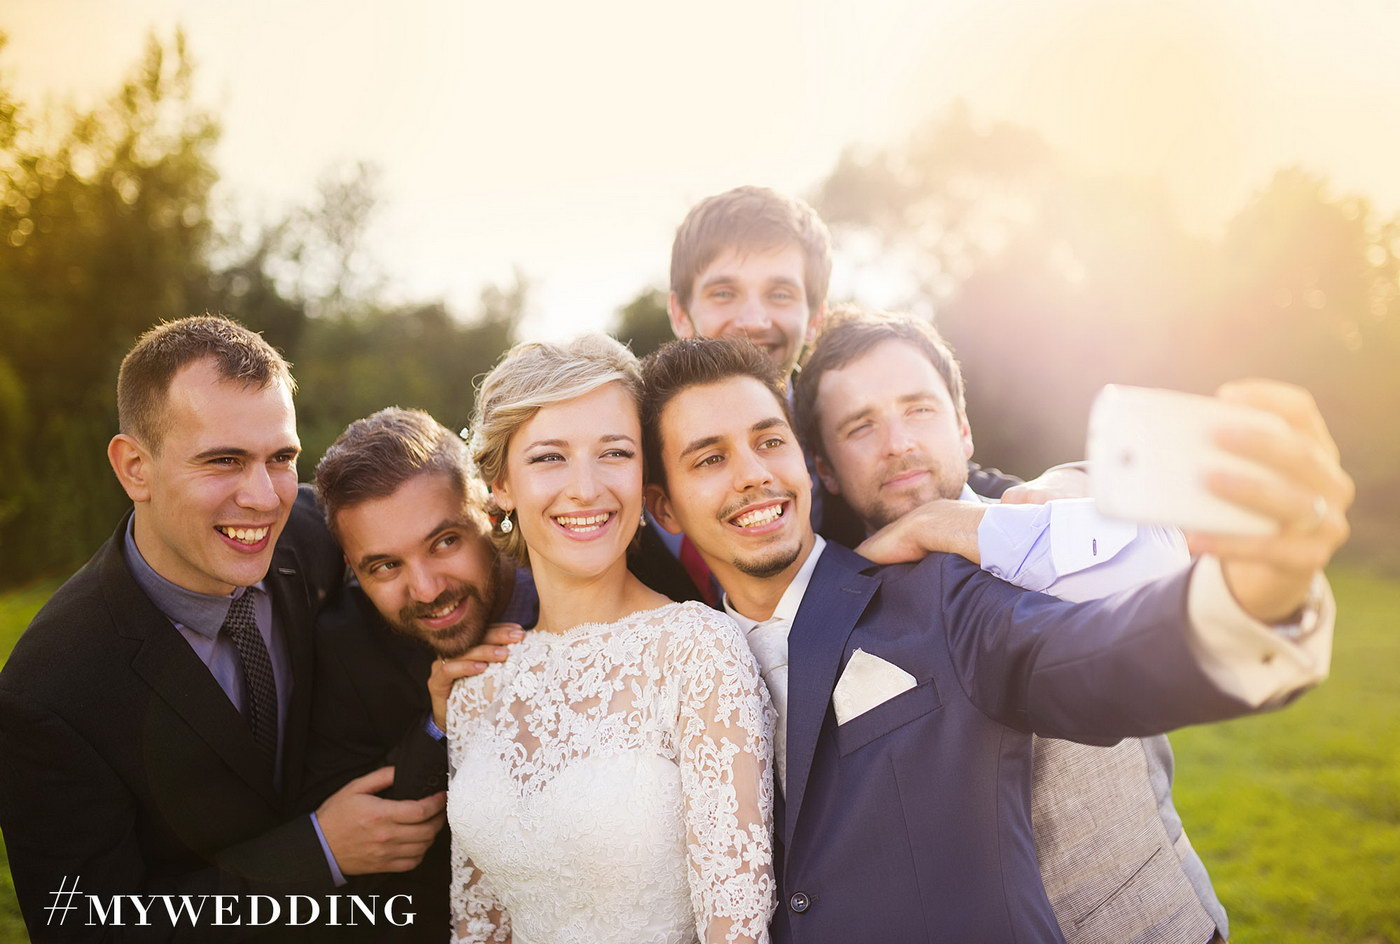 Cum alegi un hashtag potrivit pentru nunta